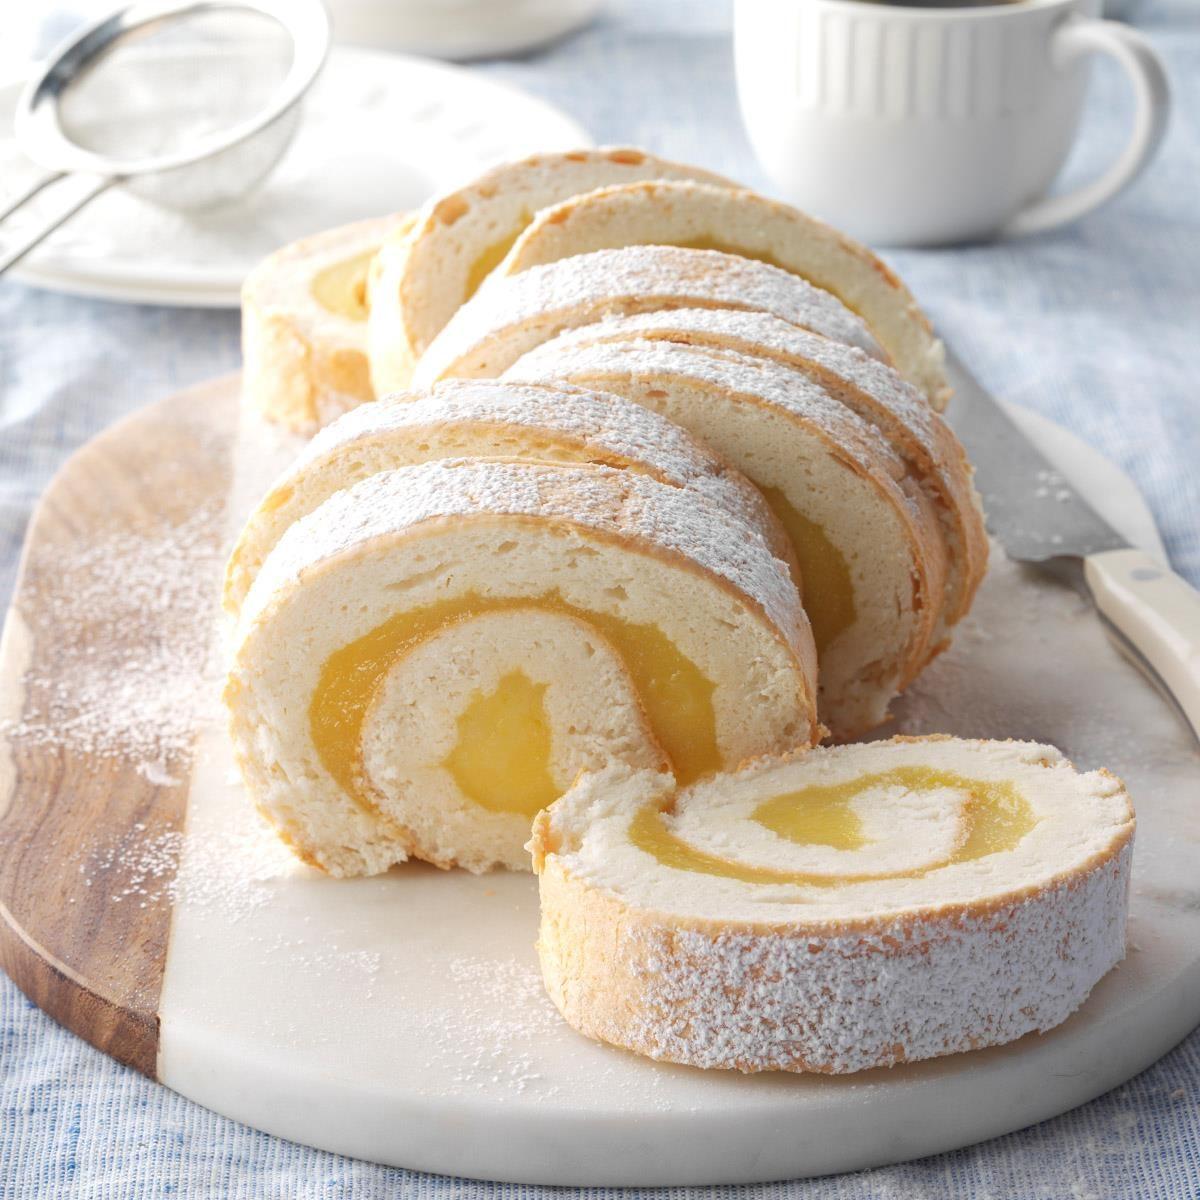 Marvelous Creations Cake Recipe